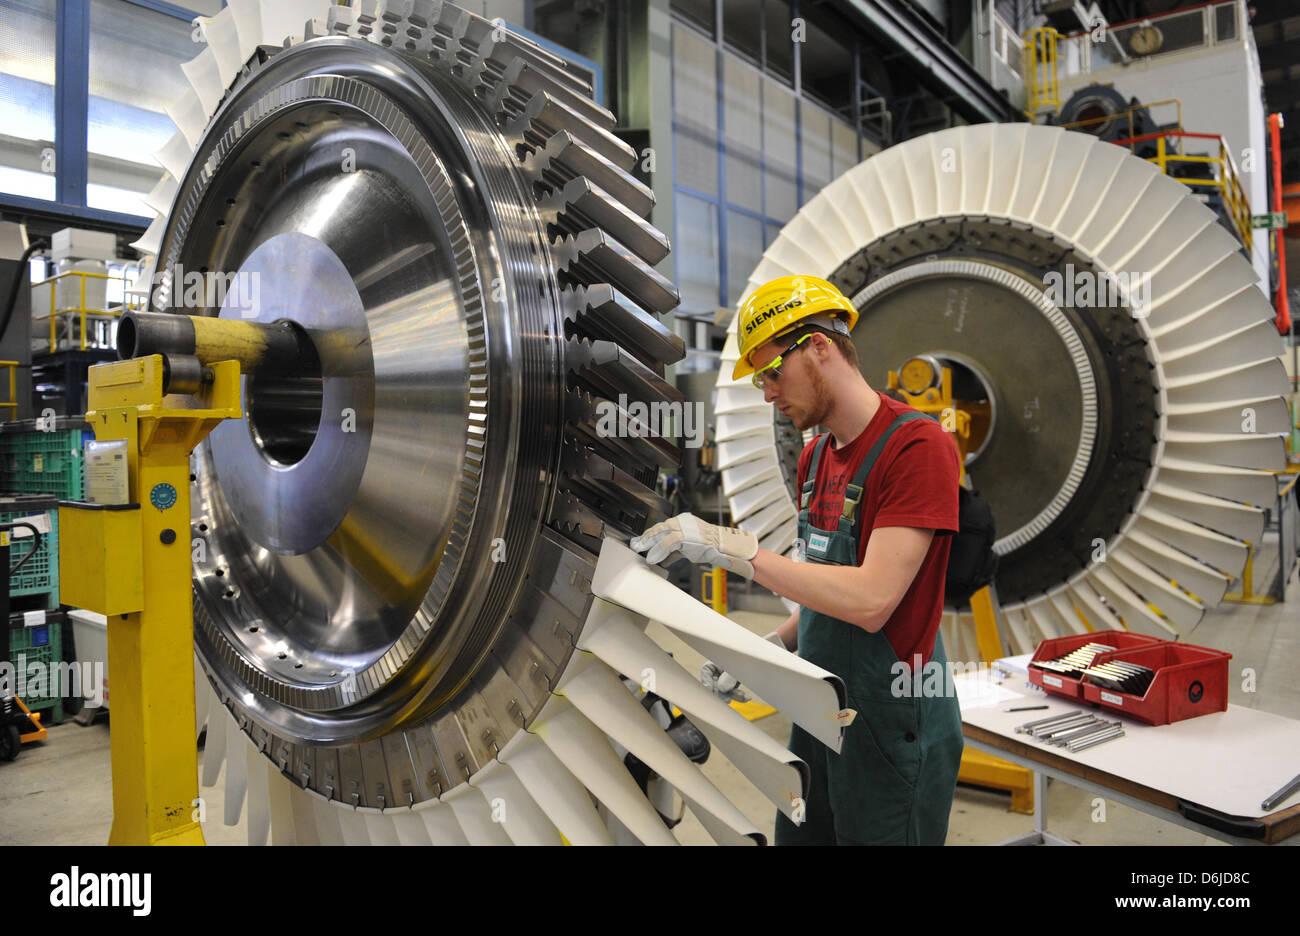 A Siemens employee works on a turbine blade wheel on the